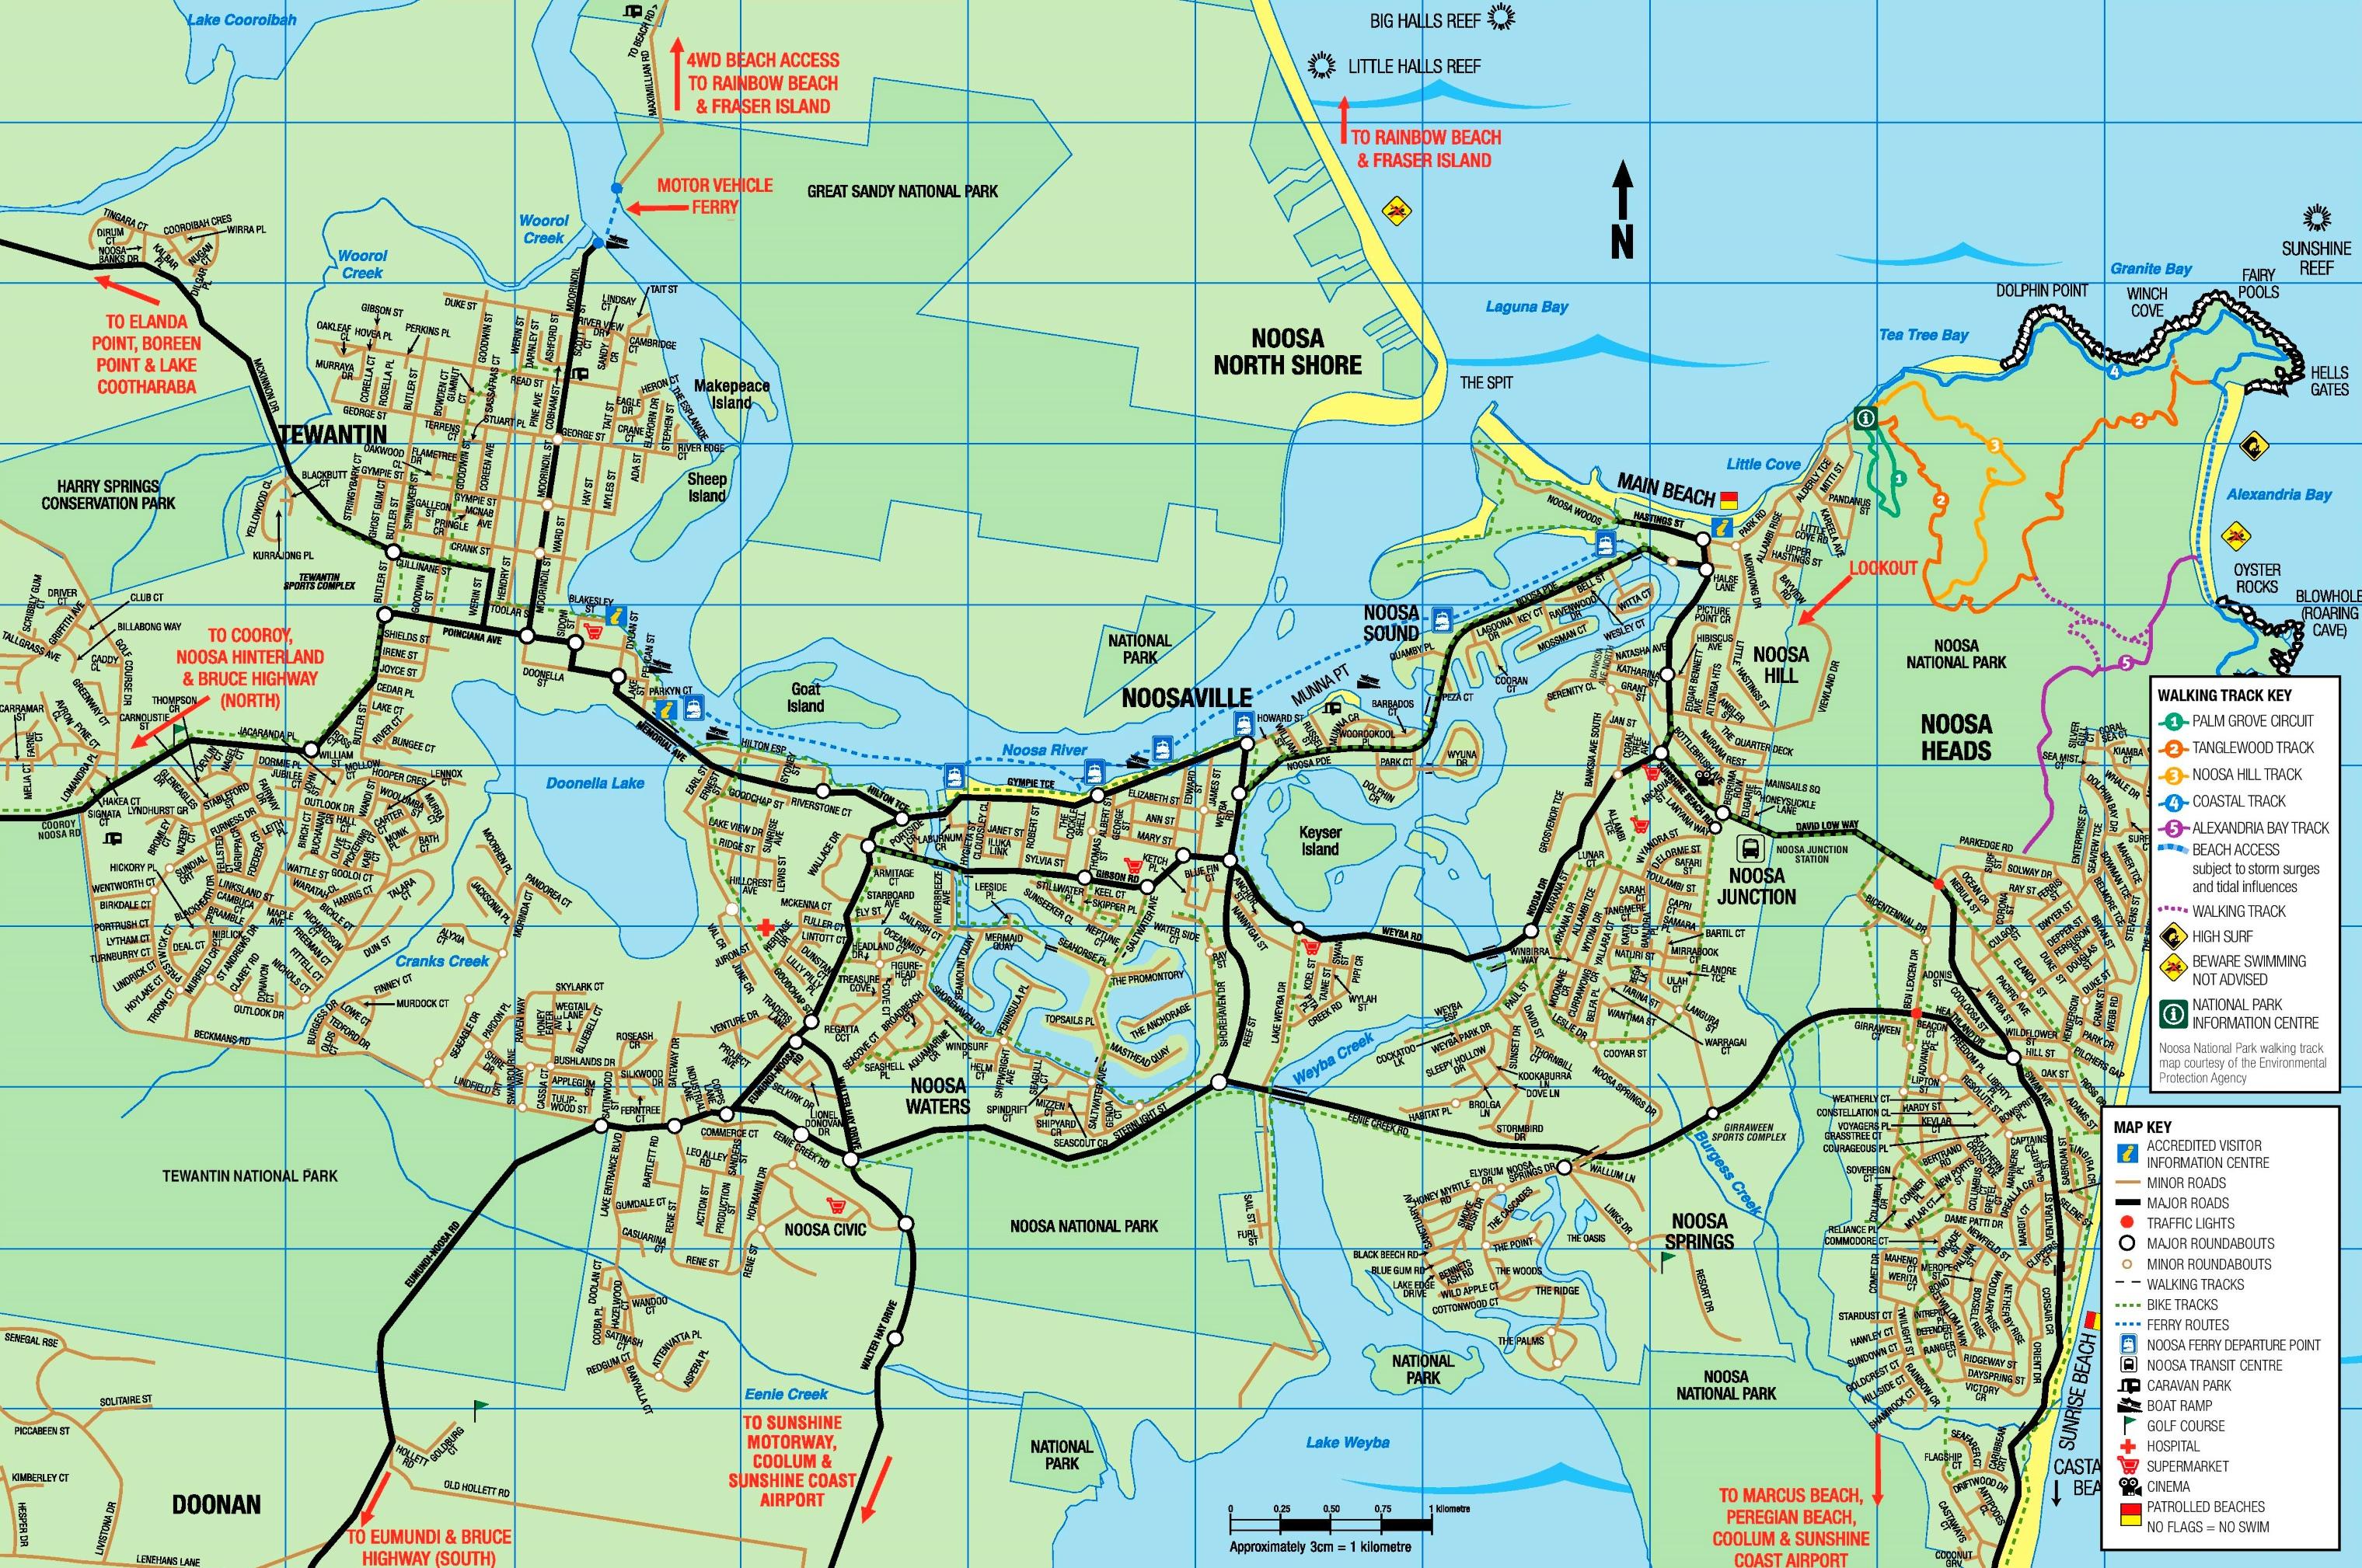 Noosa Heads tourist map